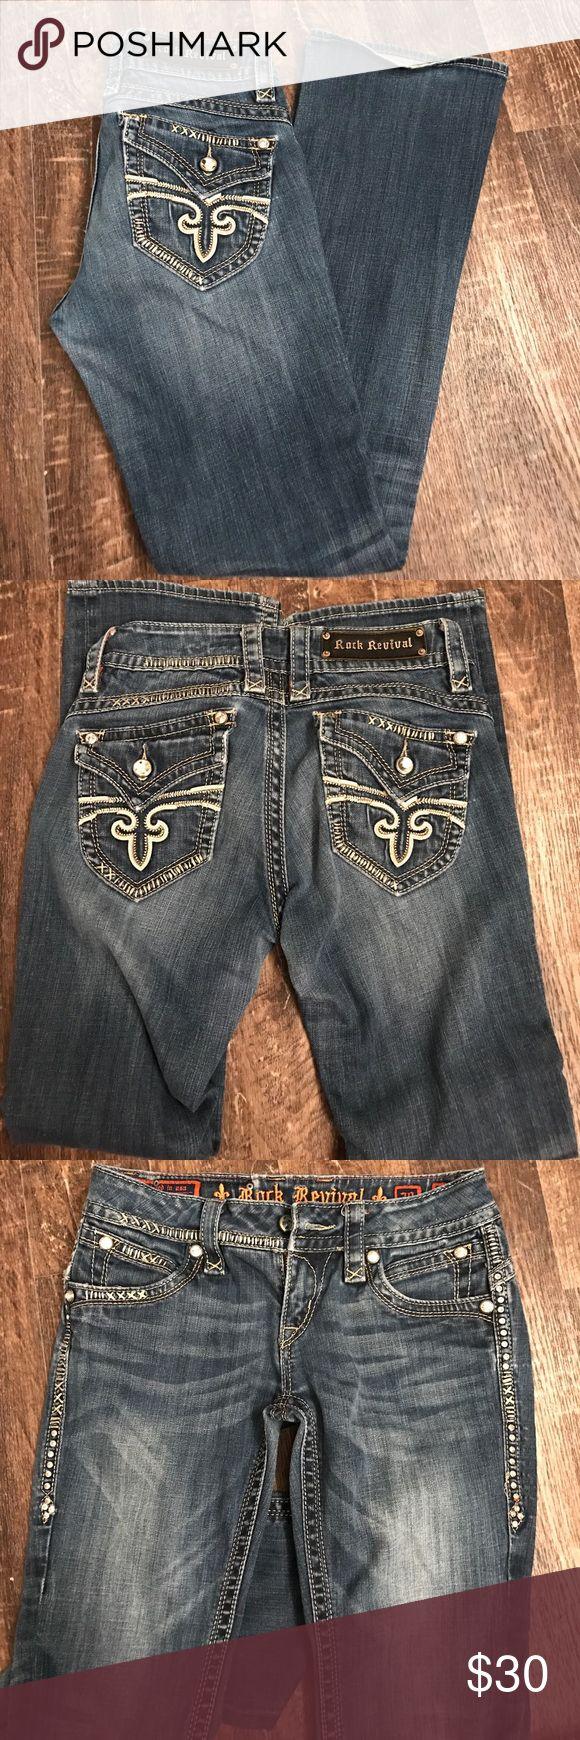 Rock Revival jeans Rock Revival jeans size 28 Rock Revival Jeans Boot Cut